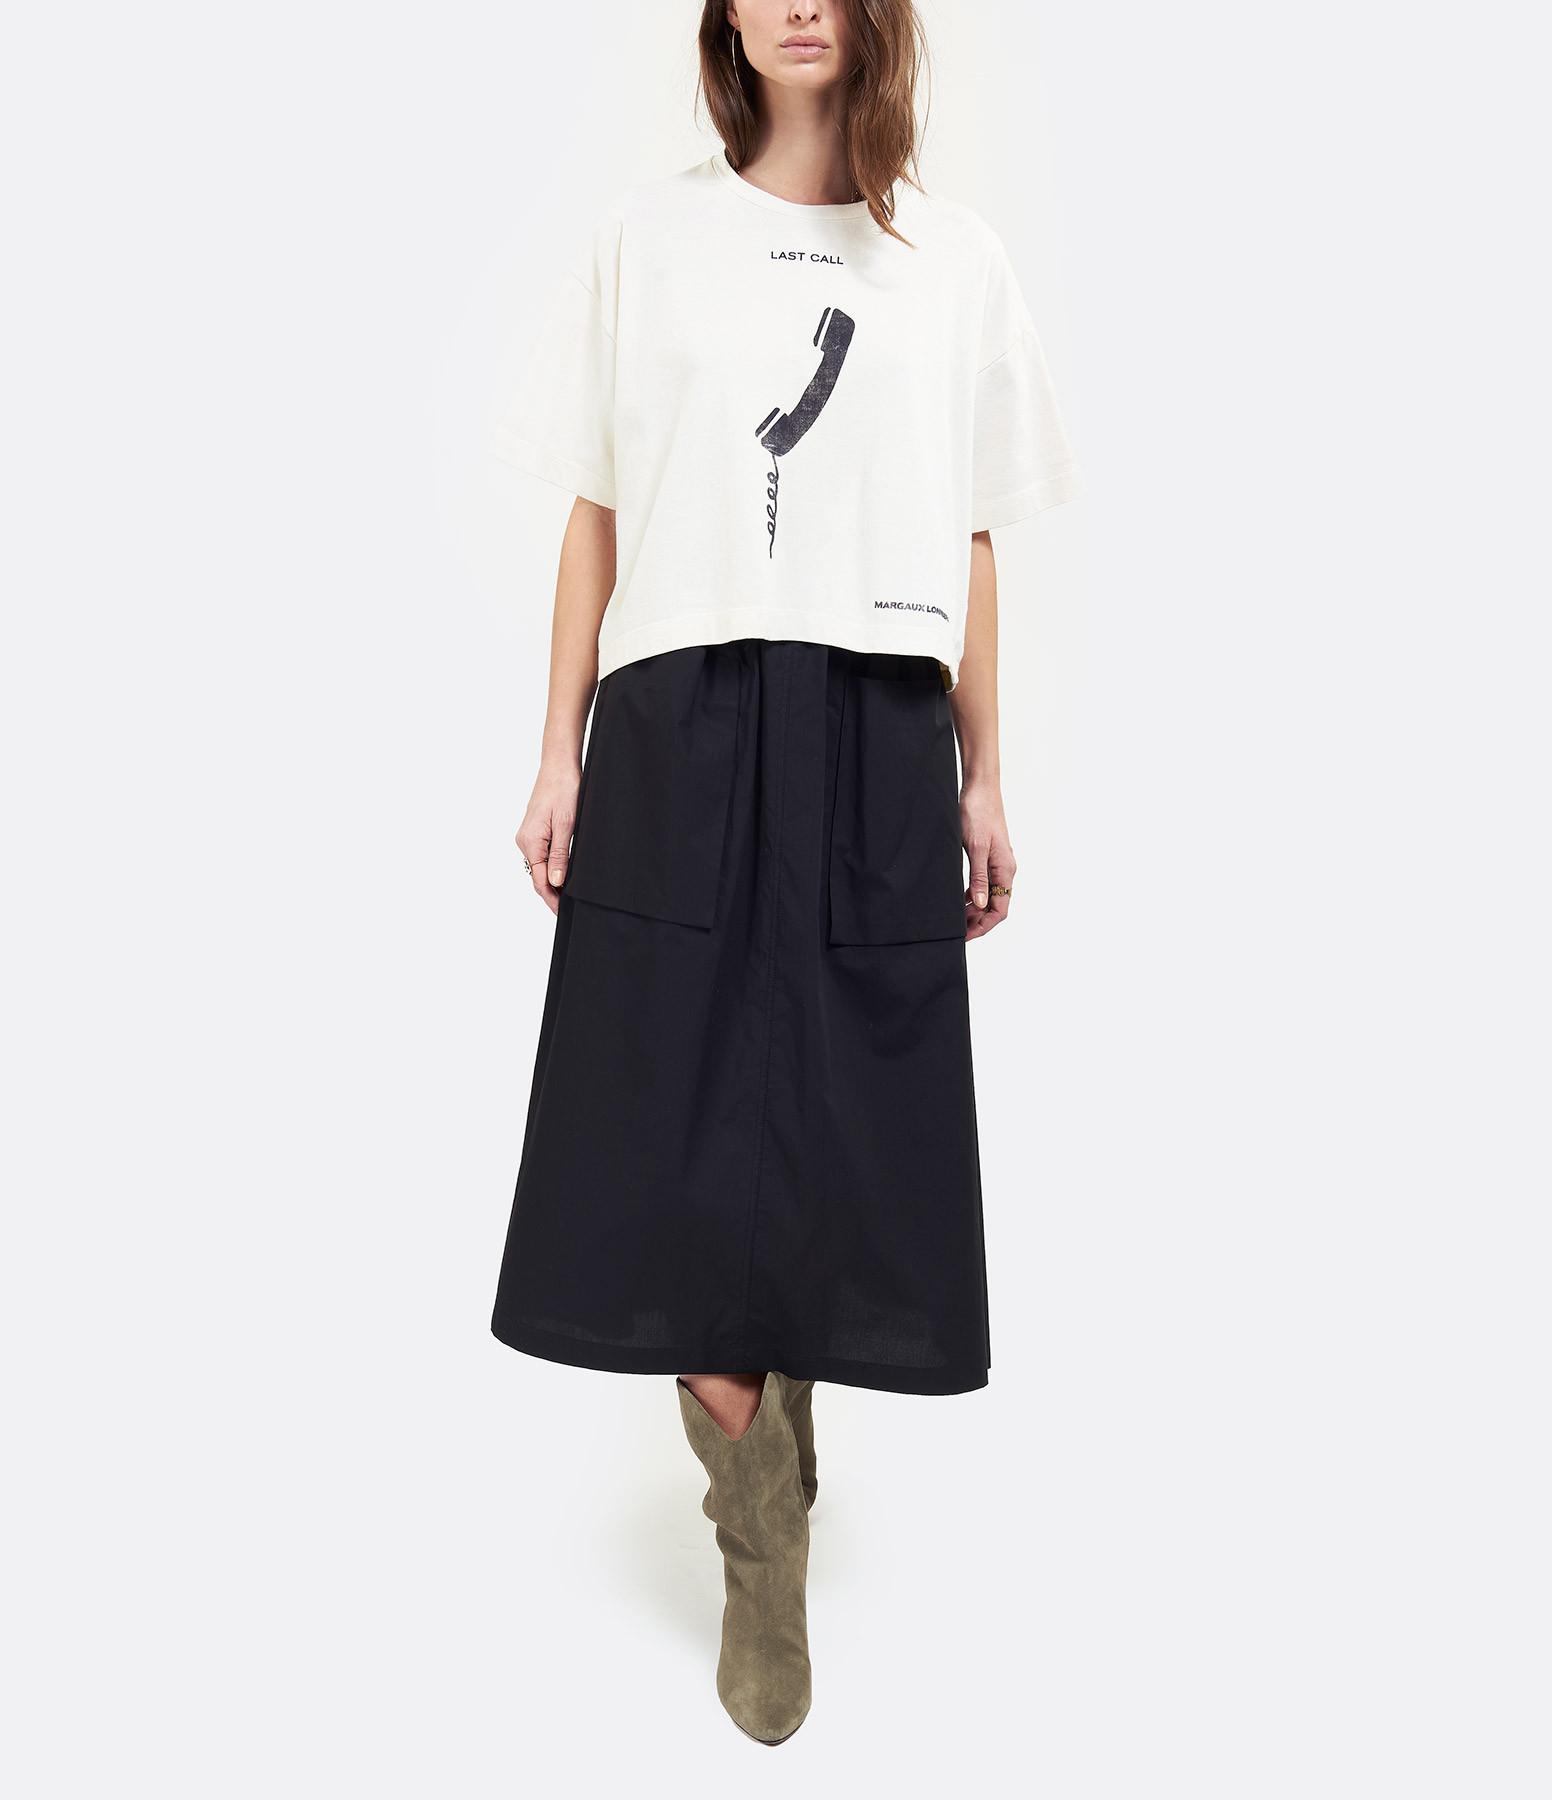 MARGAUX LONNBERG - Tee-shirt Brisa Last Call Imprimé Blanc